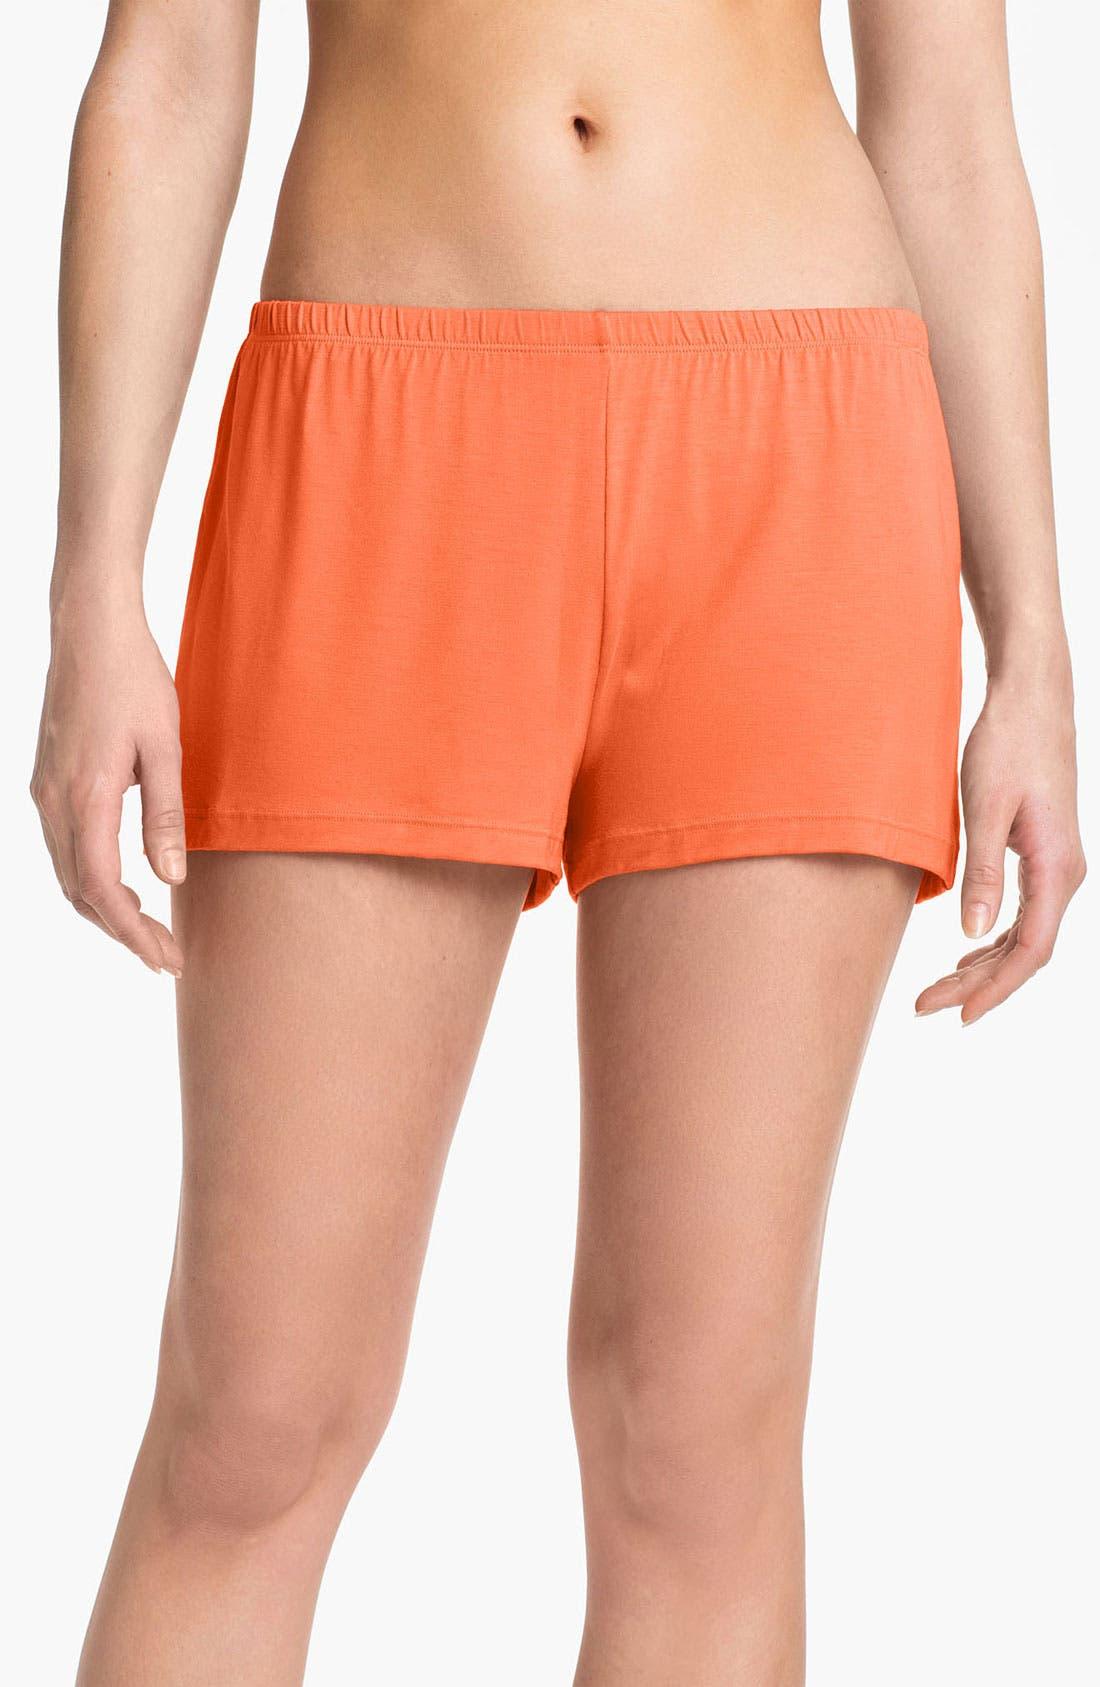 Alternate Image 1 Selected - Cosabella 'Talco' Boxer Shorts